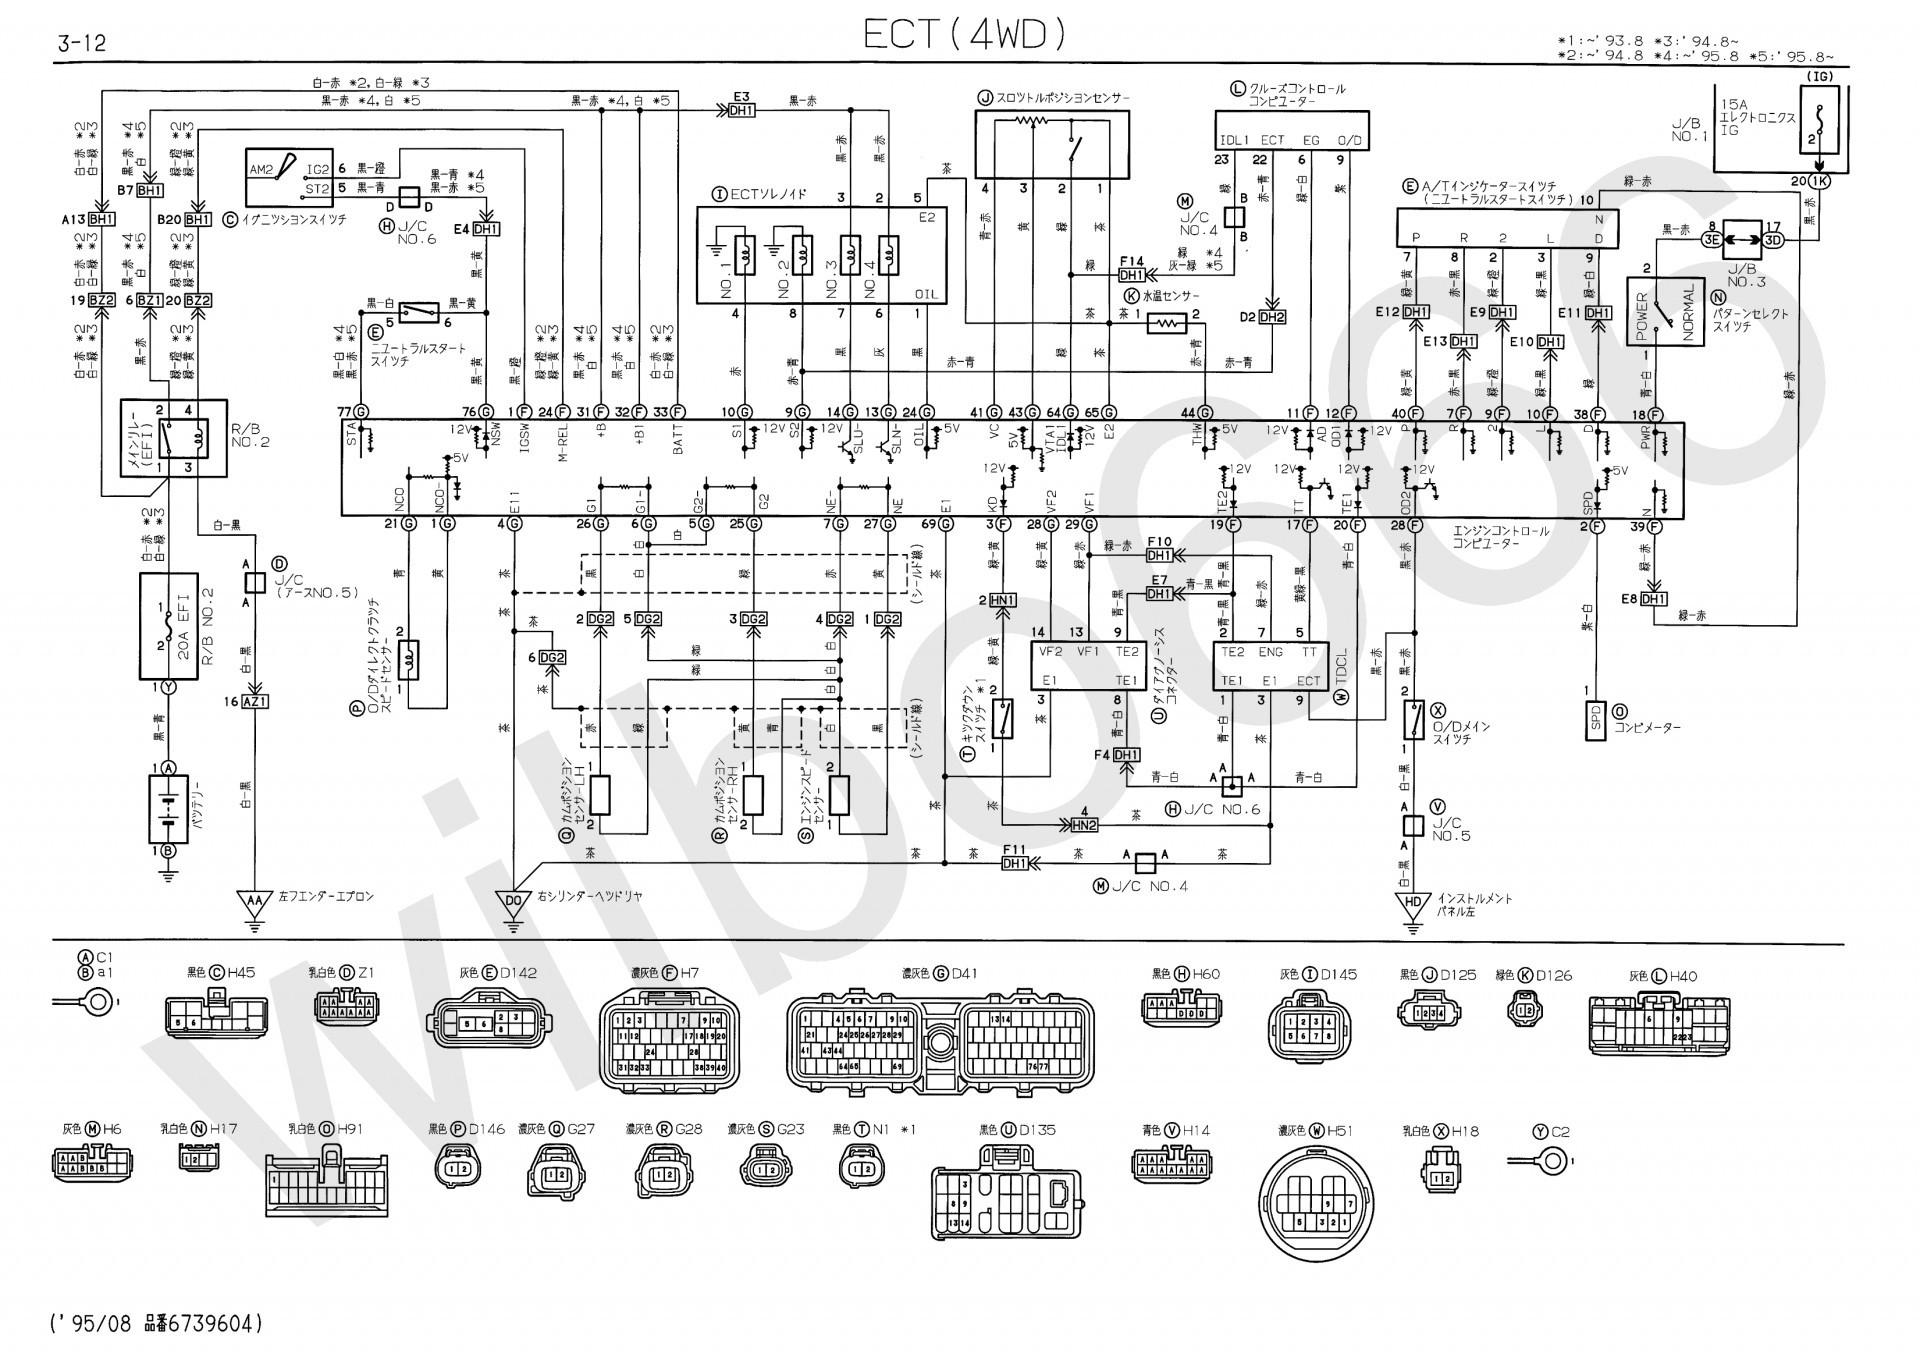 kohler wiring diagram Download-Wiring Diagram for Kohler Engine Fresh Diagram Engine Electrical Floor Plan 2004 2010 Bmw X3 E83 1-m